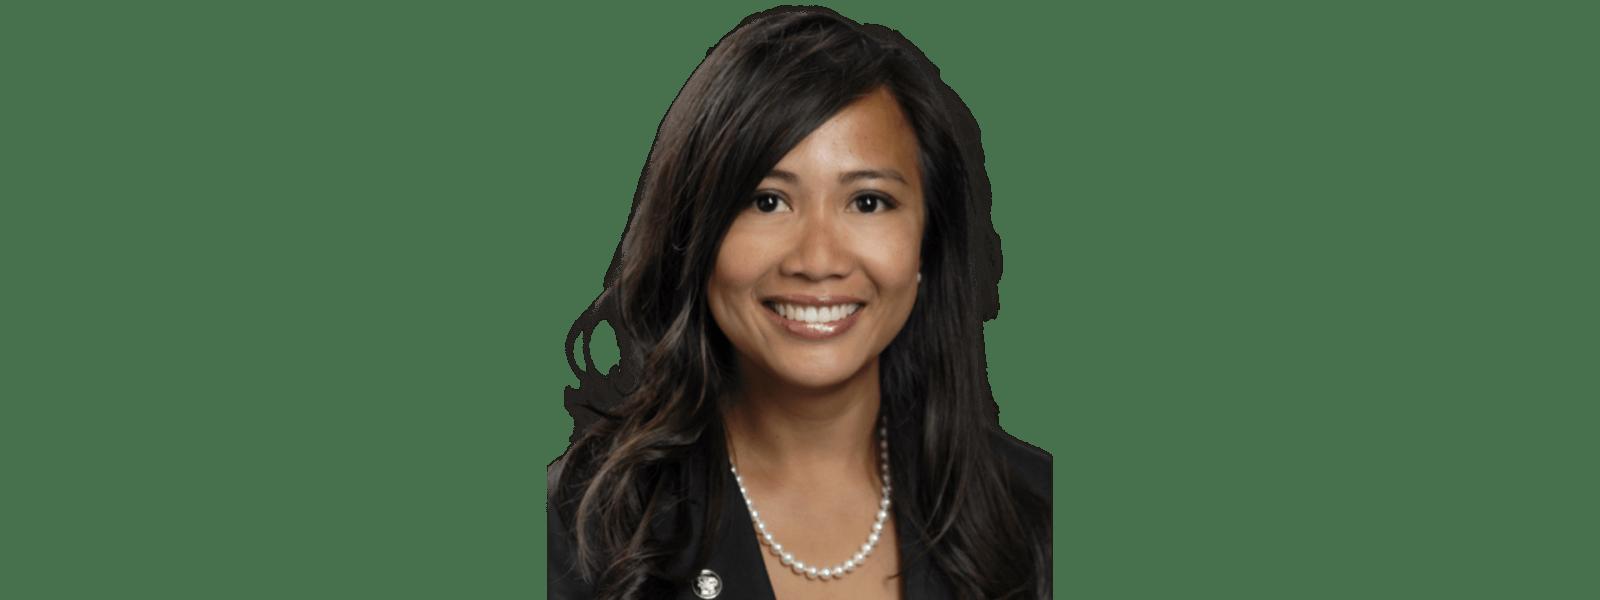 Cindy Gunawan